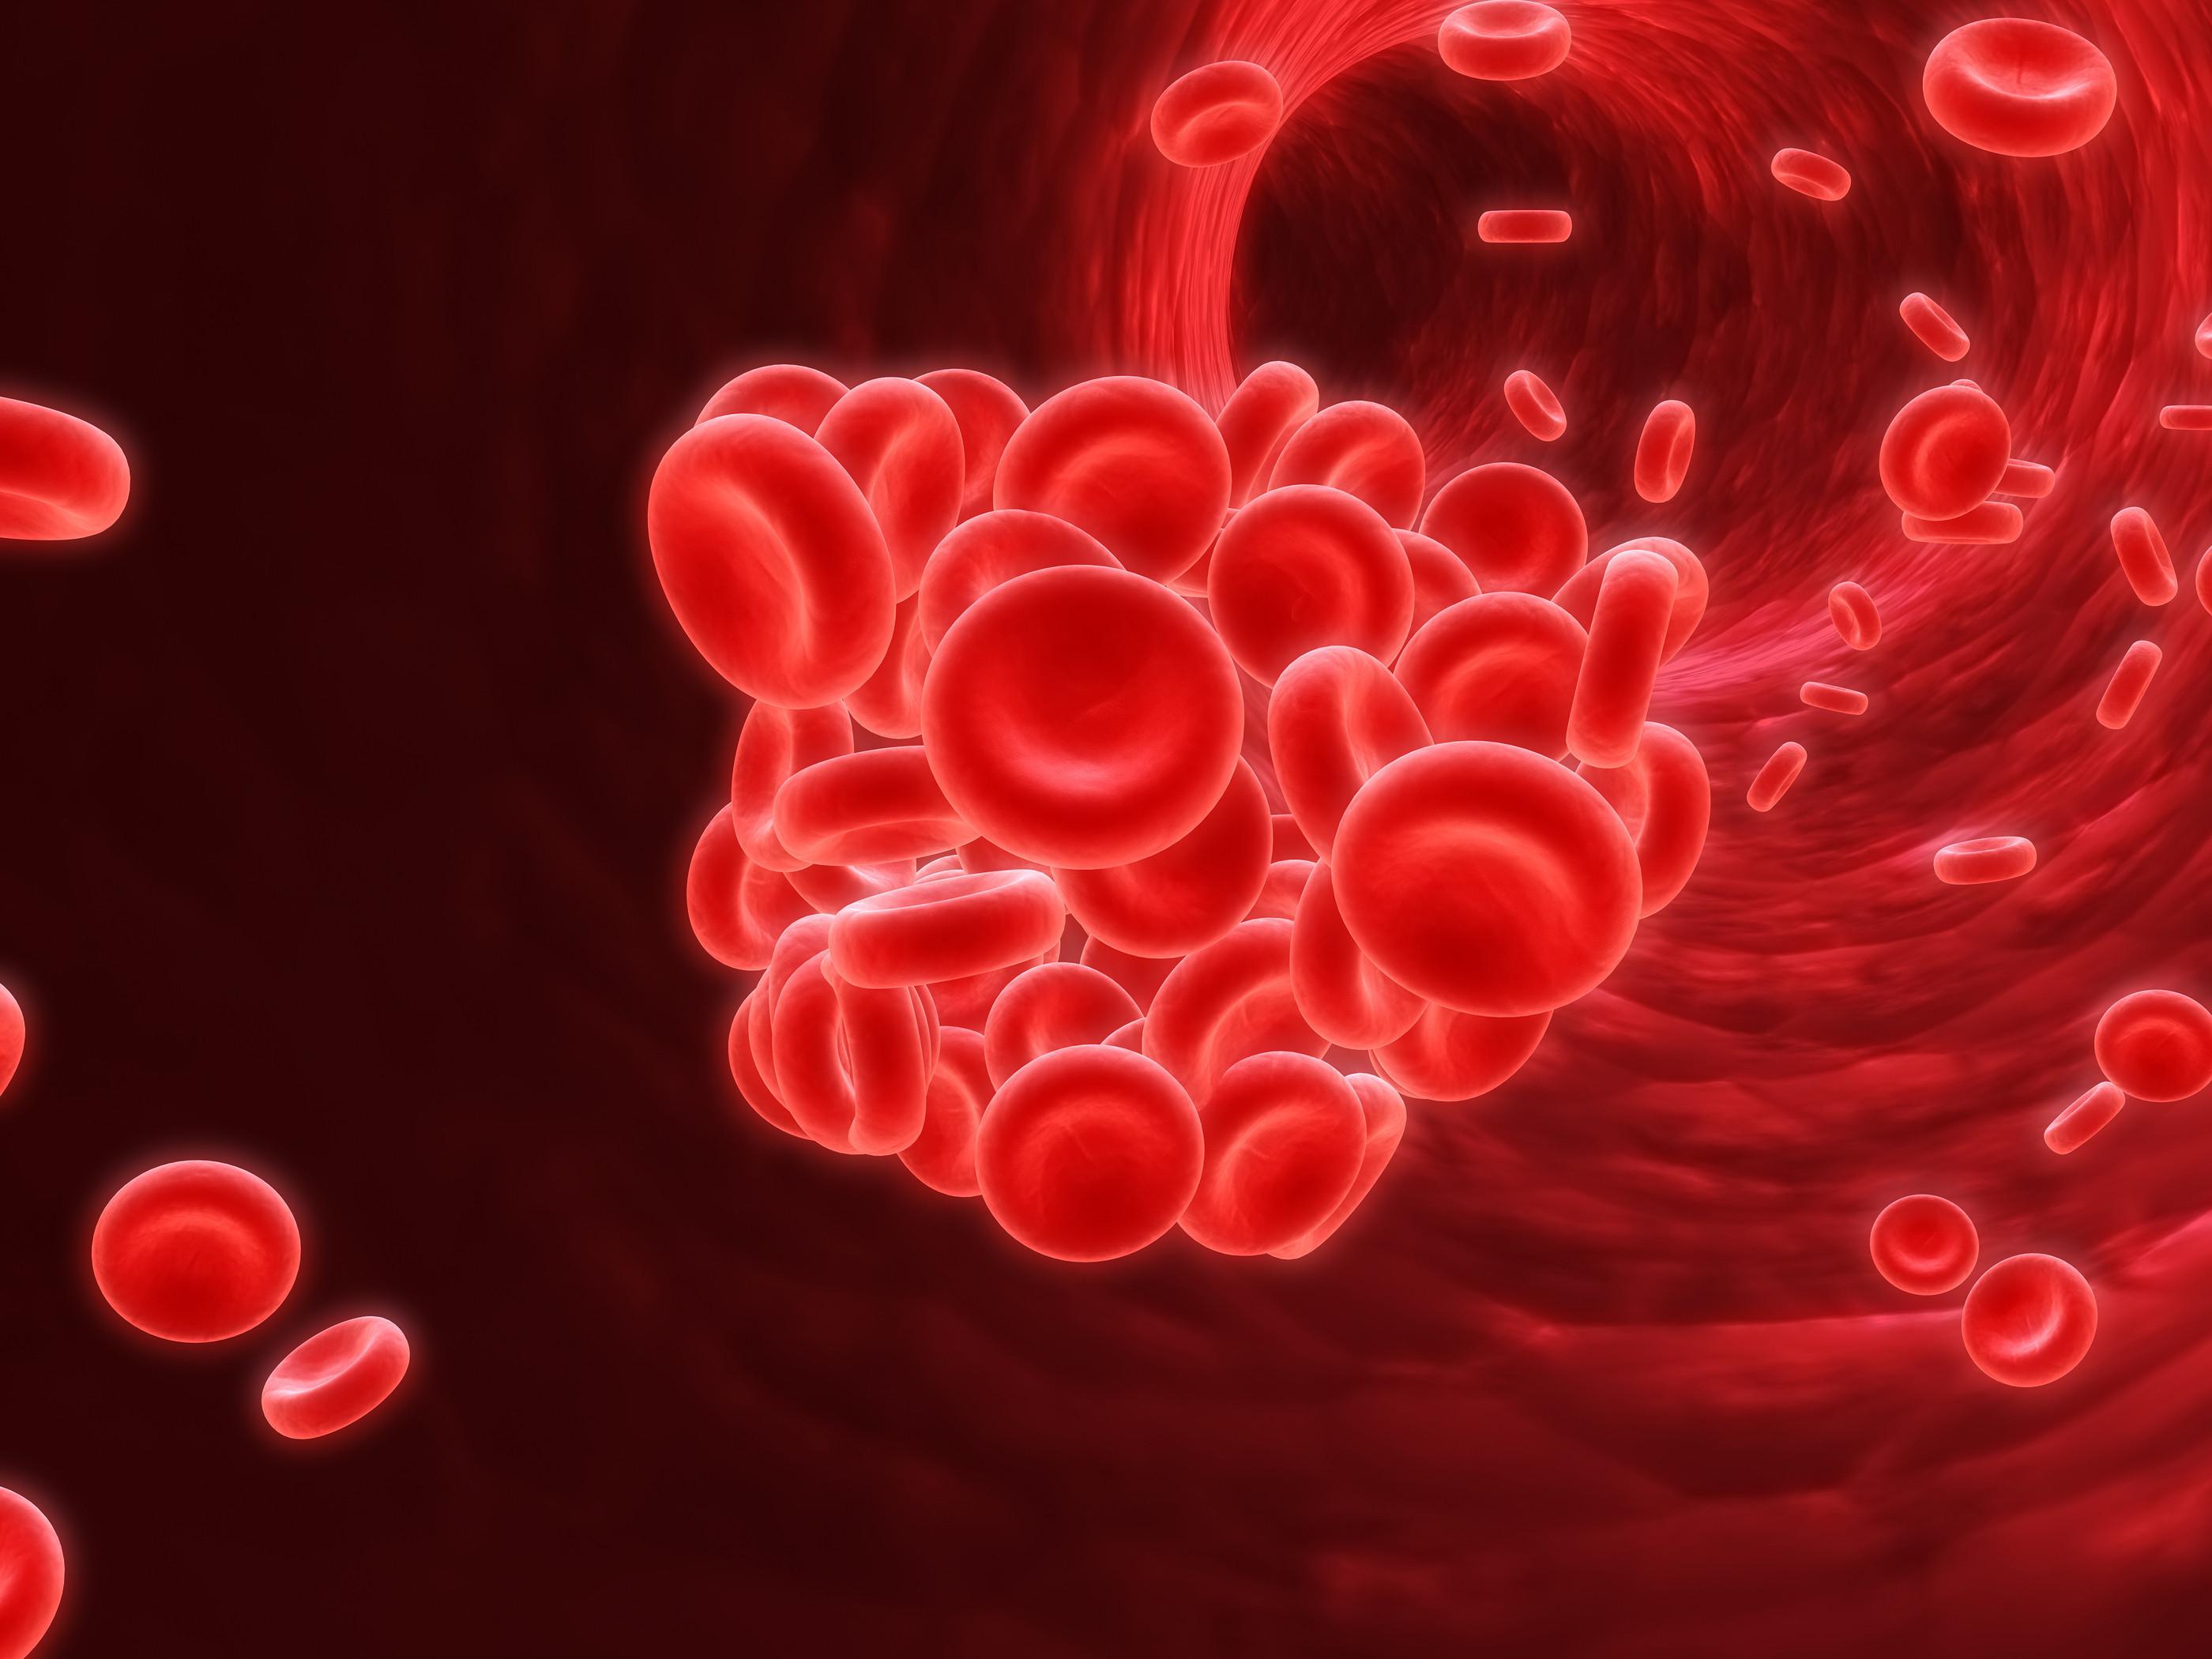 heart-cholesterol-blood-clot-75675601